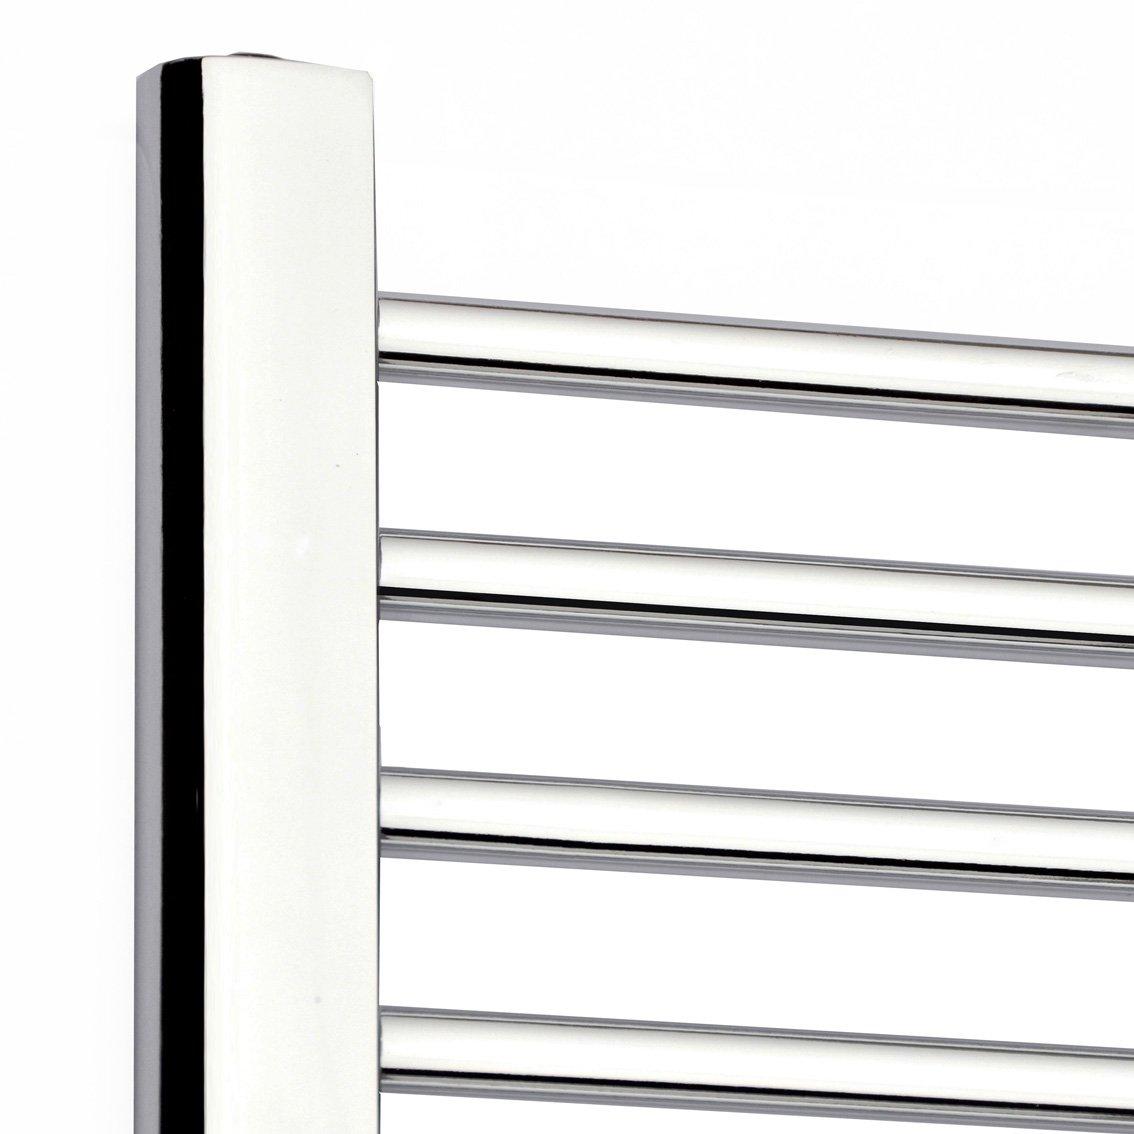 Natasha ladder rail straight modern electric towel radiator in chrome - Ibathuk 1000 X 500 Thermostatic Electric Heated Towel Rail Bathroom Radiator Re52 Ibathuk Amazon Co Uk Diy Tools